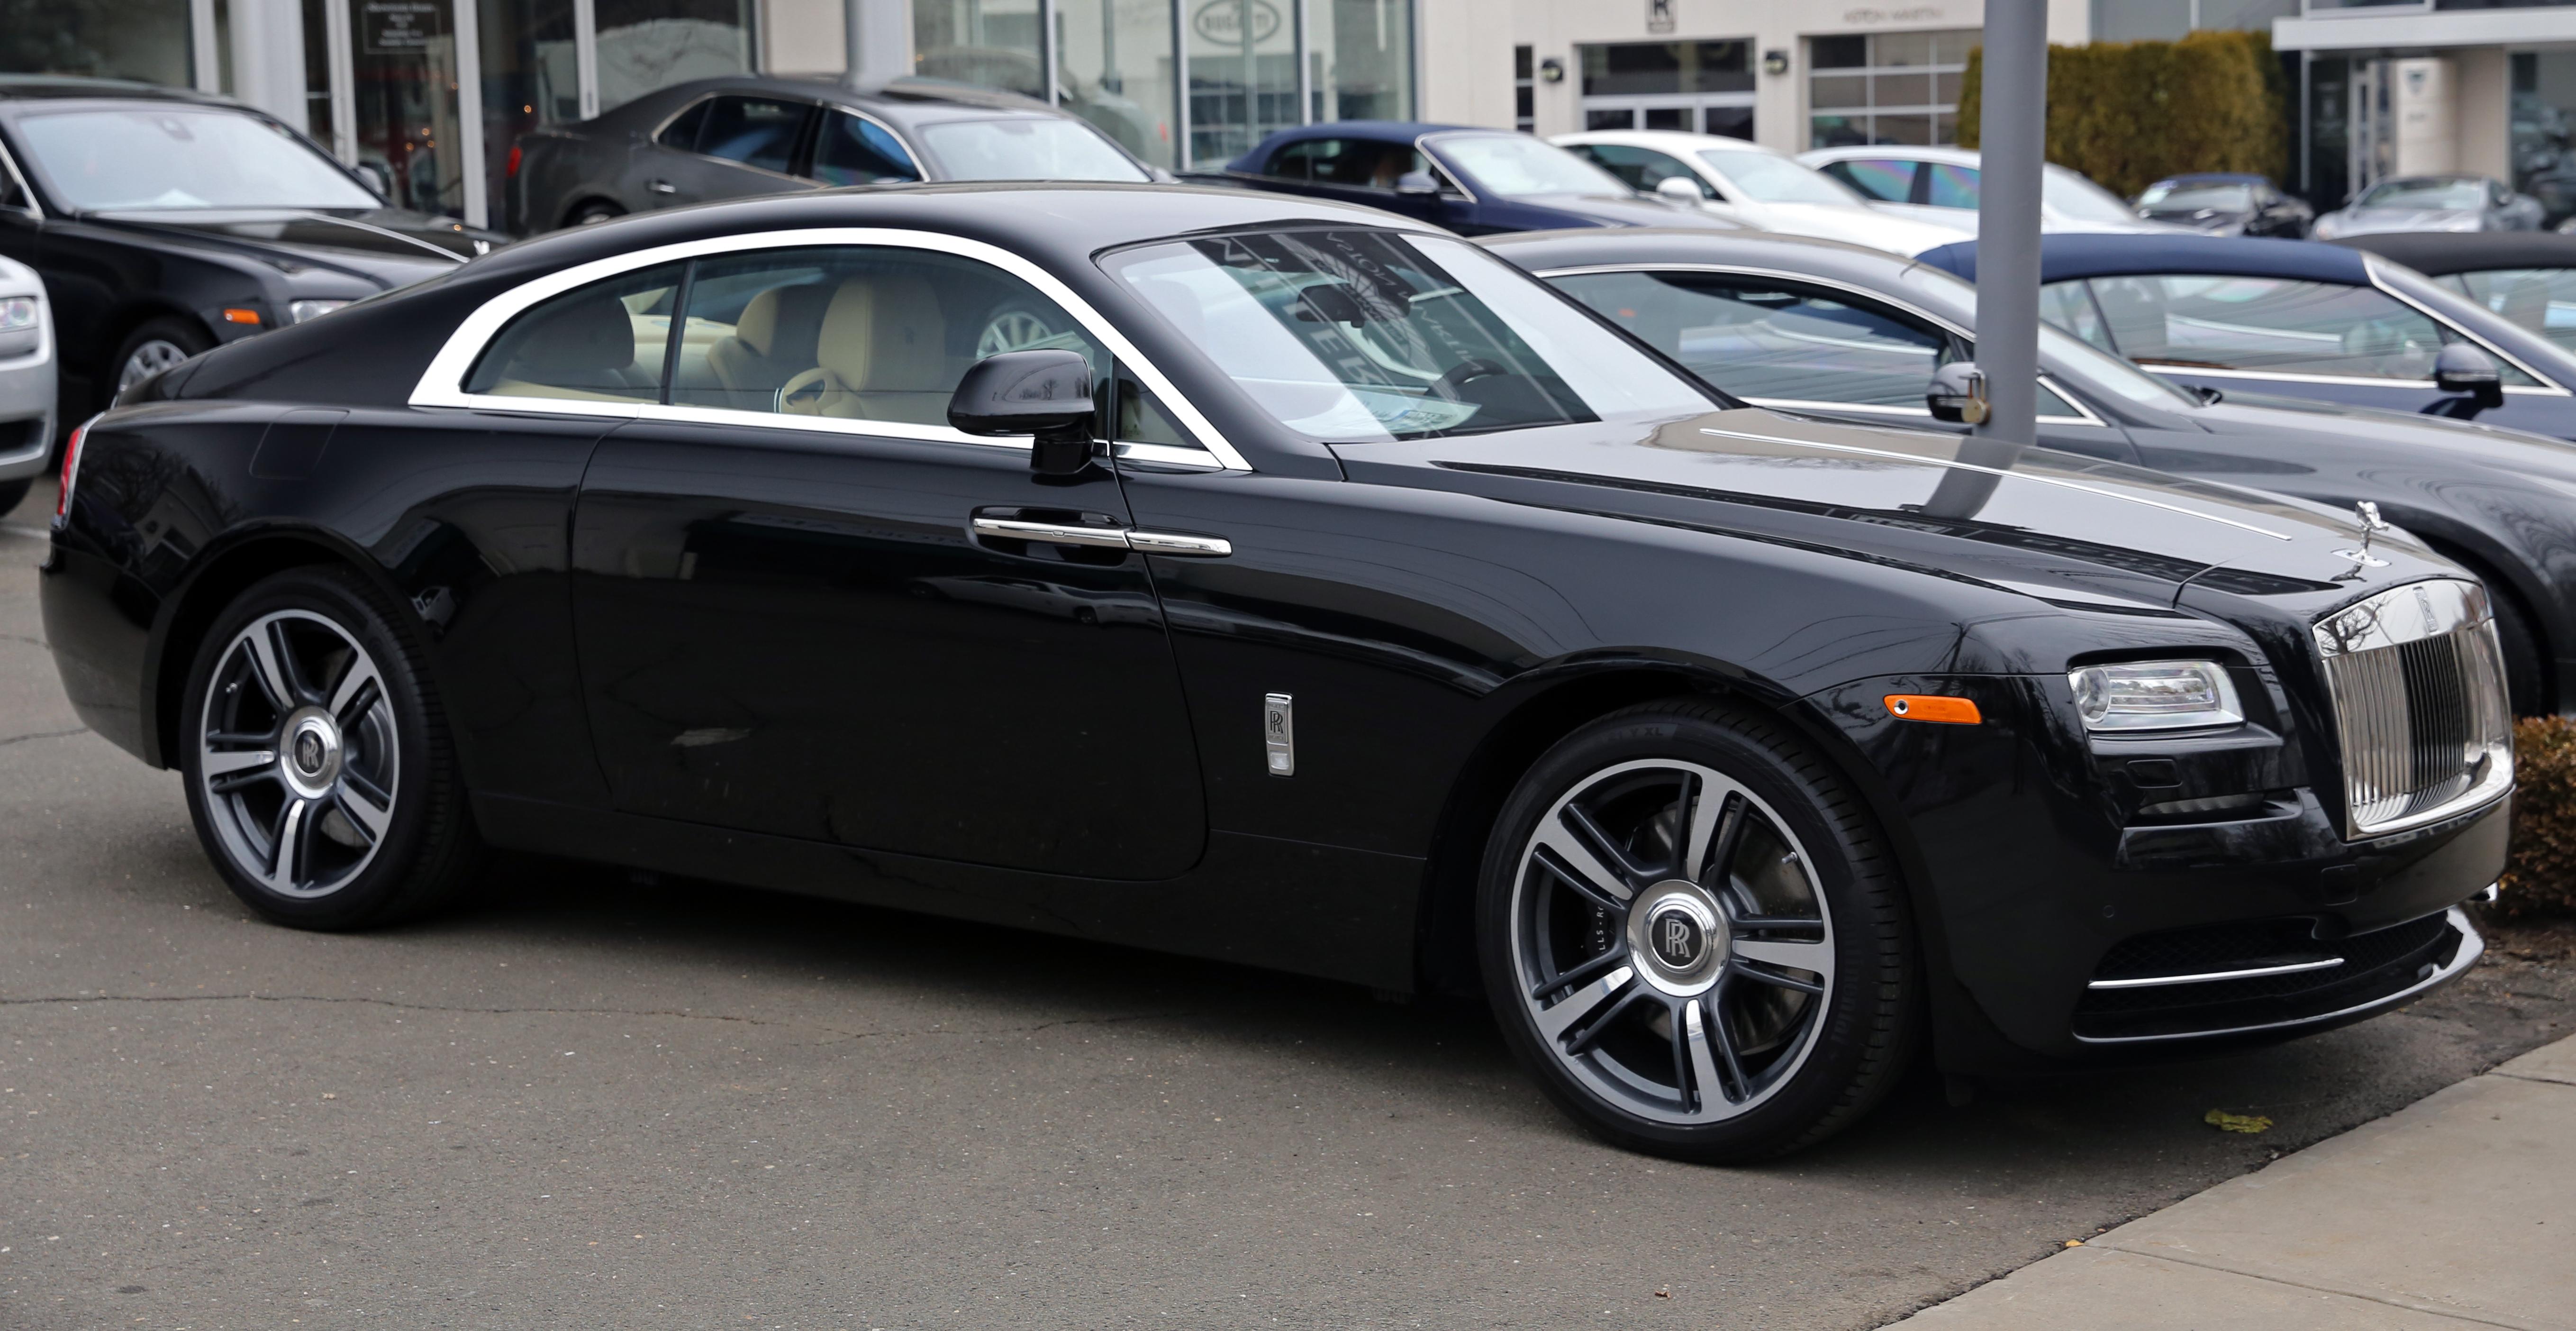 Rolls Royce Wraith Wikipedia 2014 Rolls-royce Wraith